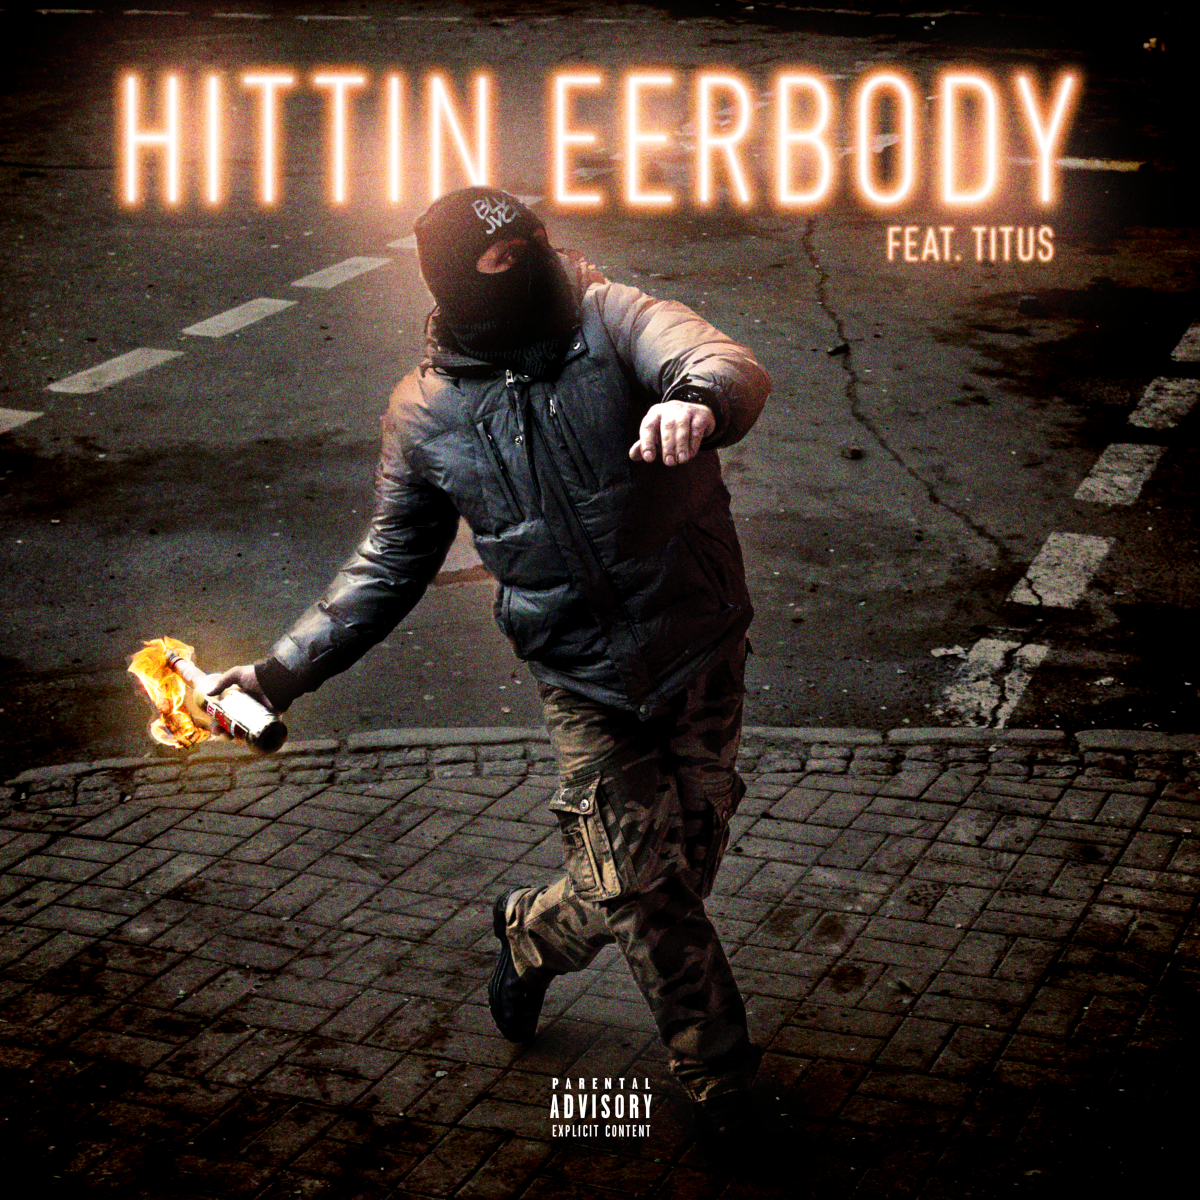 BLVK JVCK - Hittin Eerbody (Album Artwork)